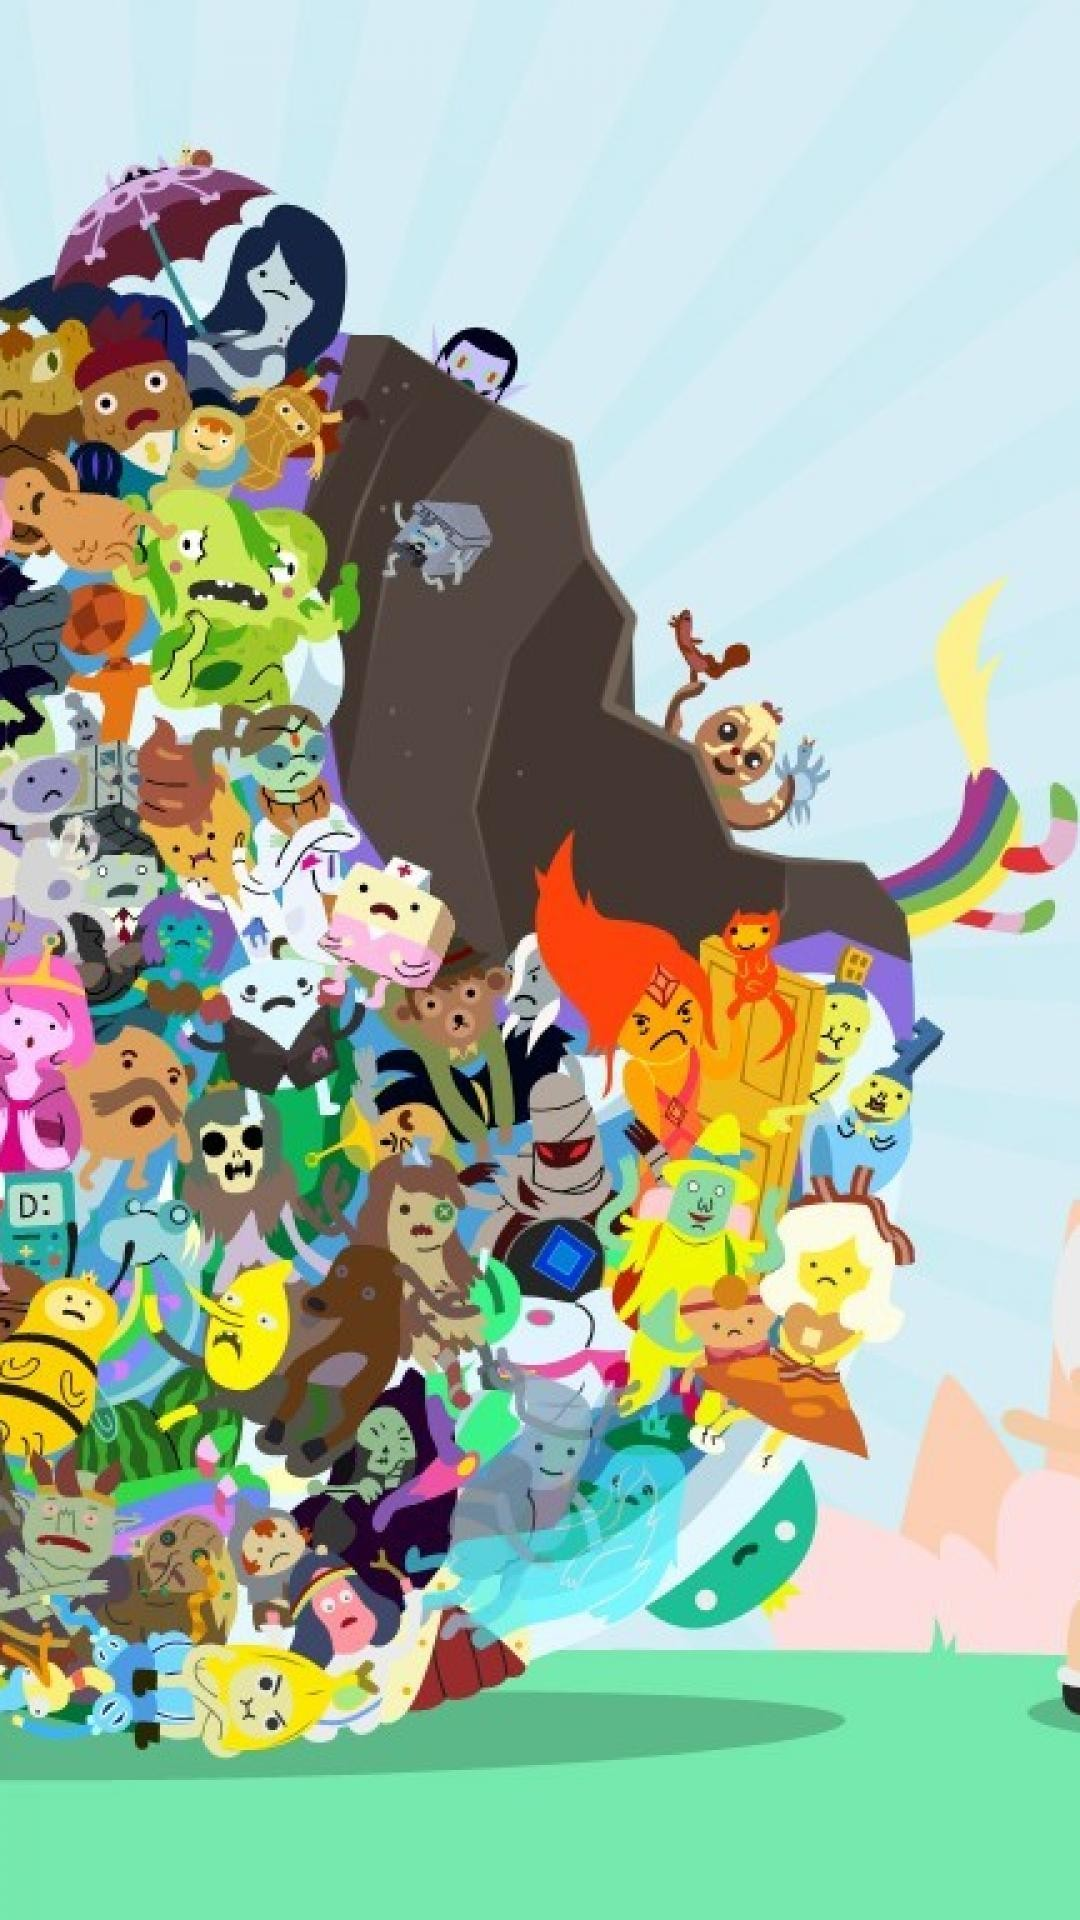 Adventure Time Wallpaper - Adventure Time Wallpaper Handy , HD Wallpaper & Backgrounds